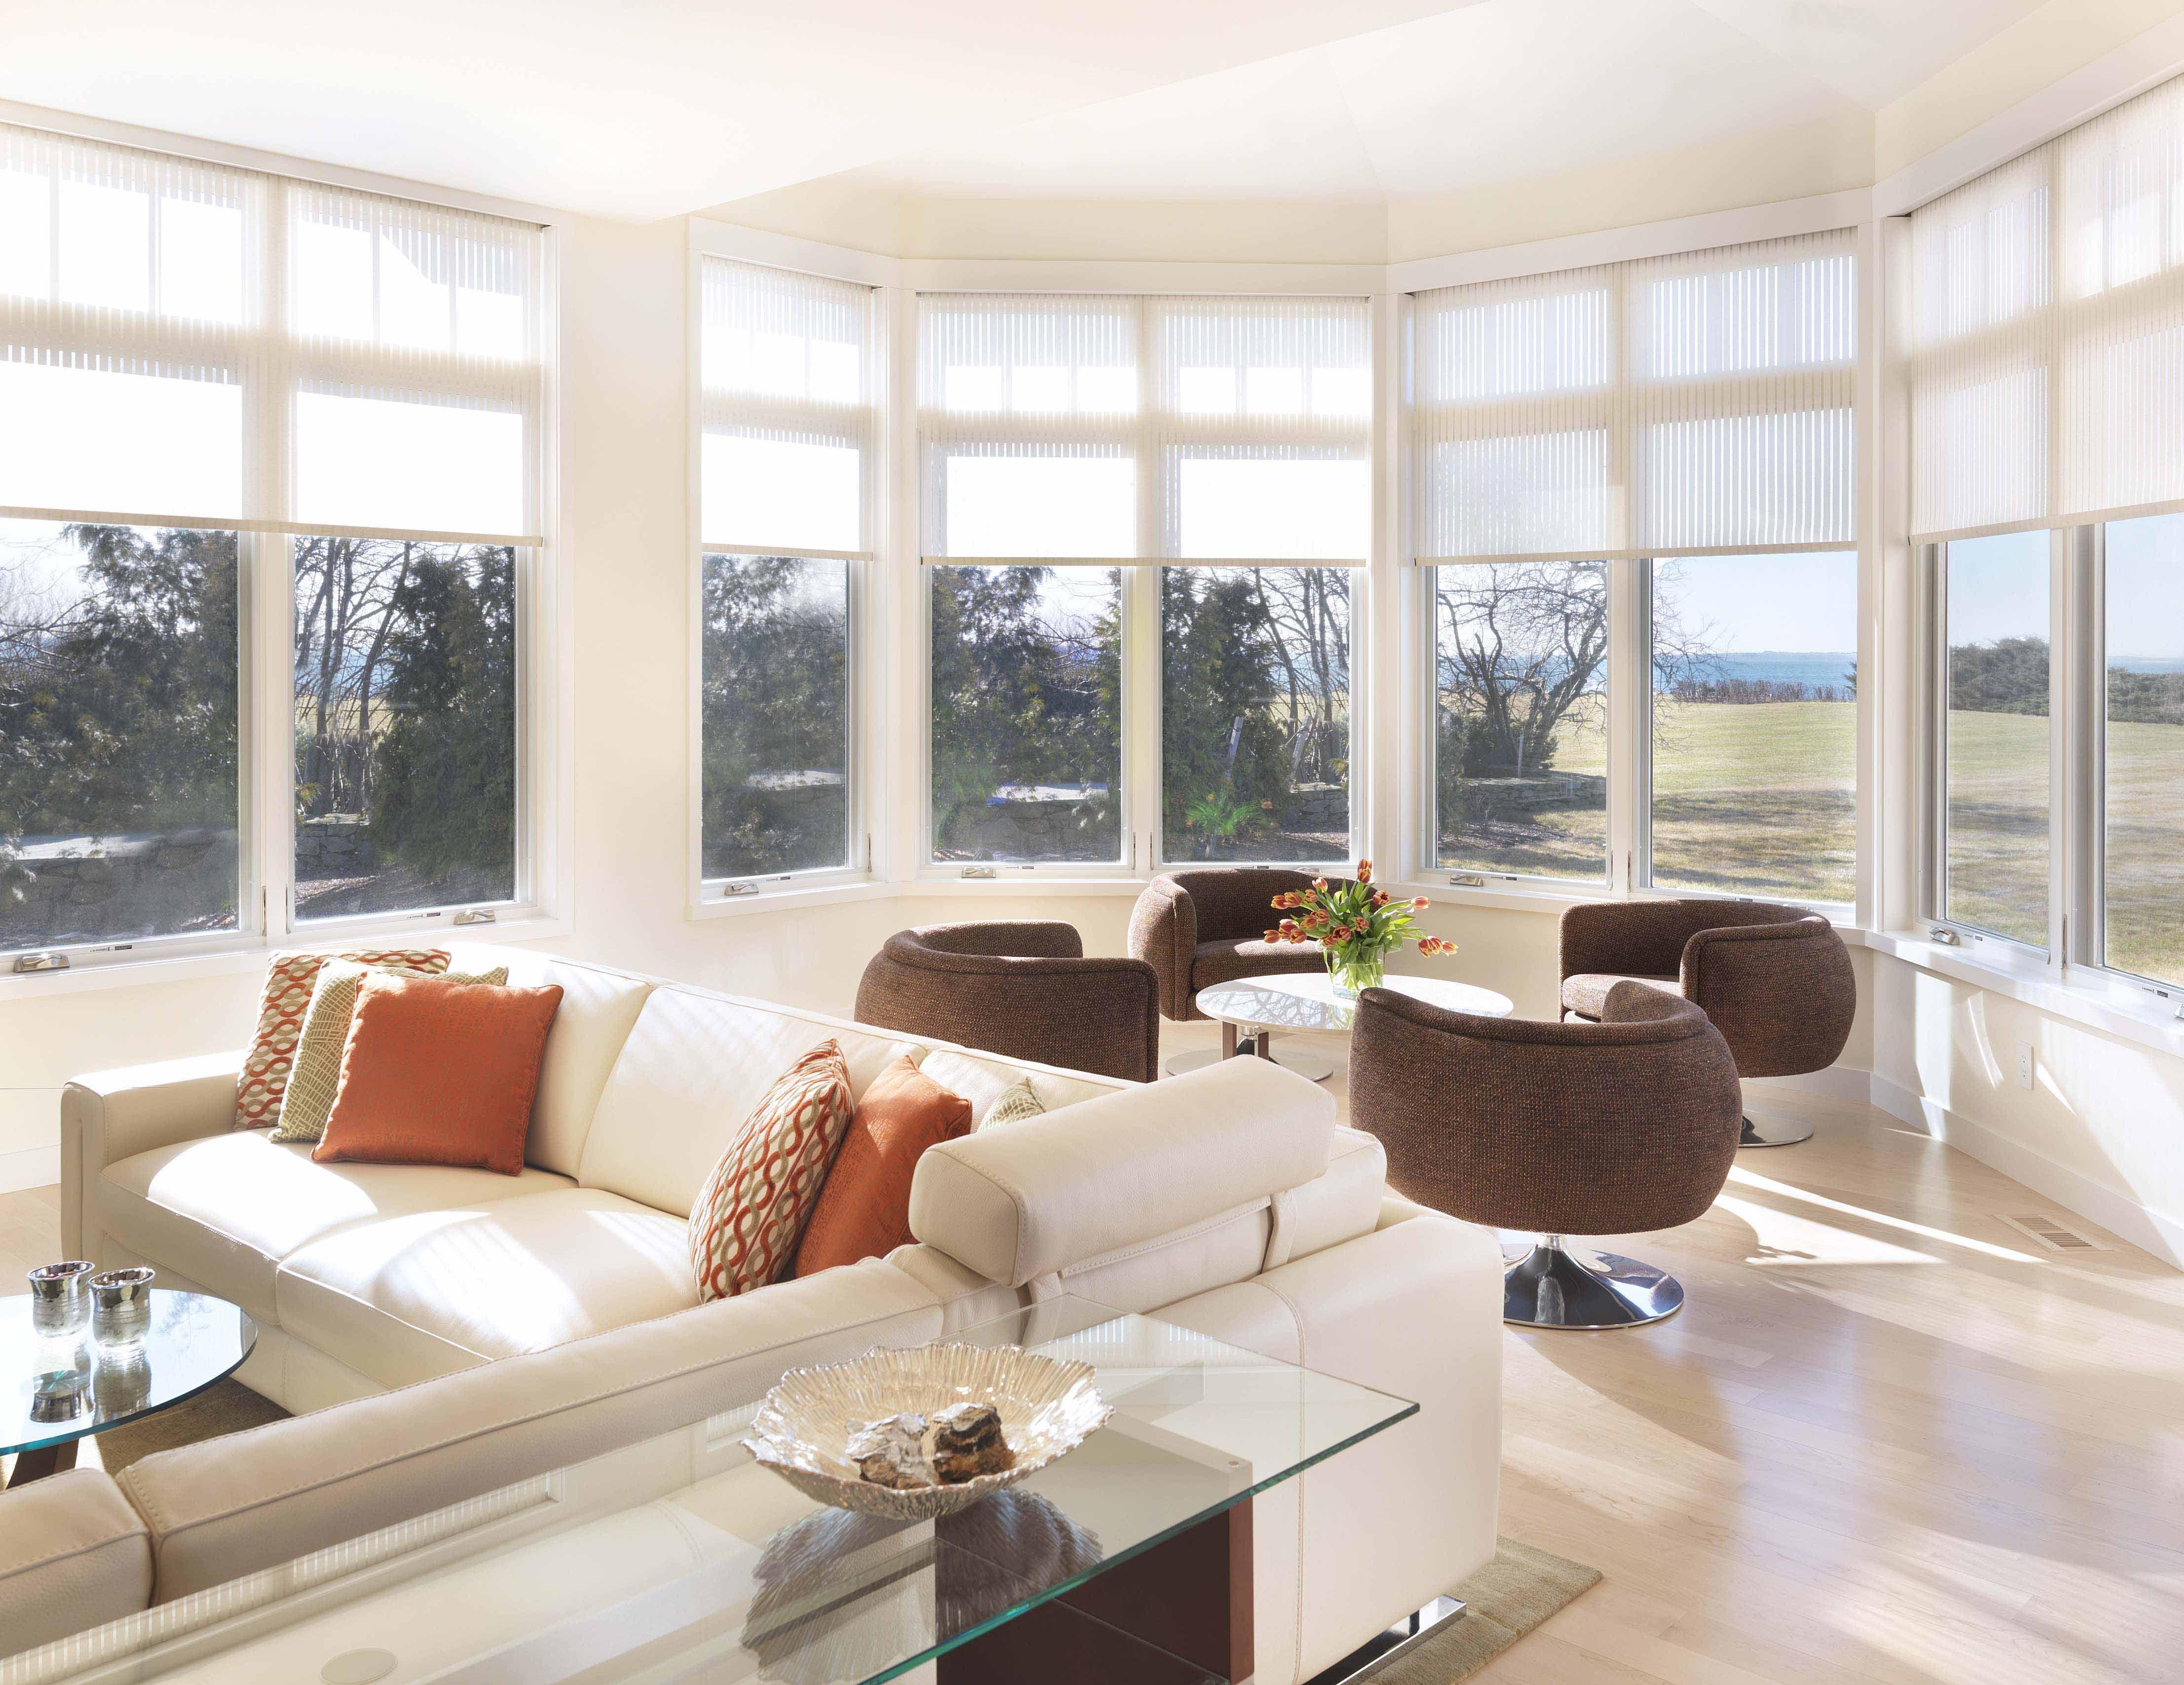 Taylor interior design rhode island for Interior designers rhode island